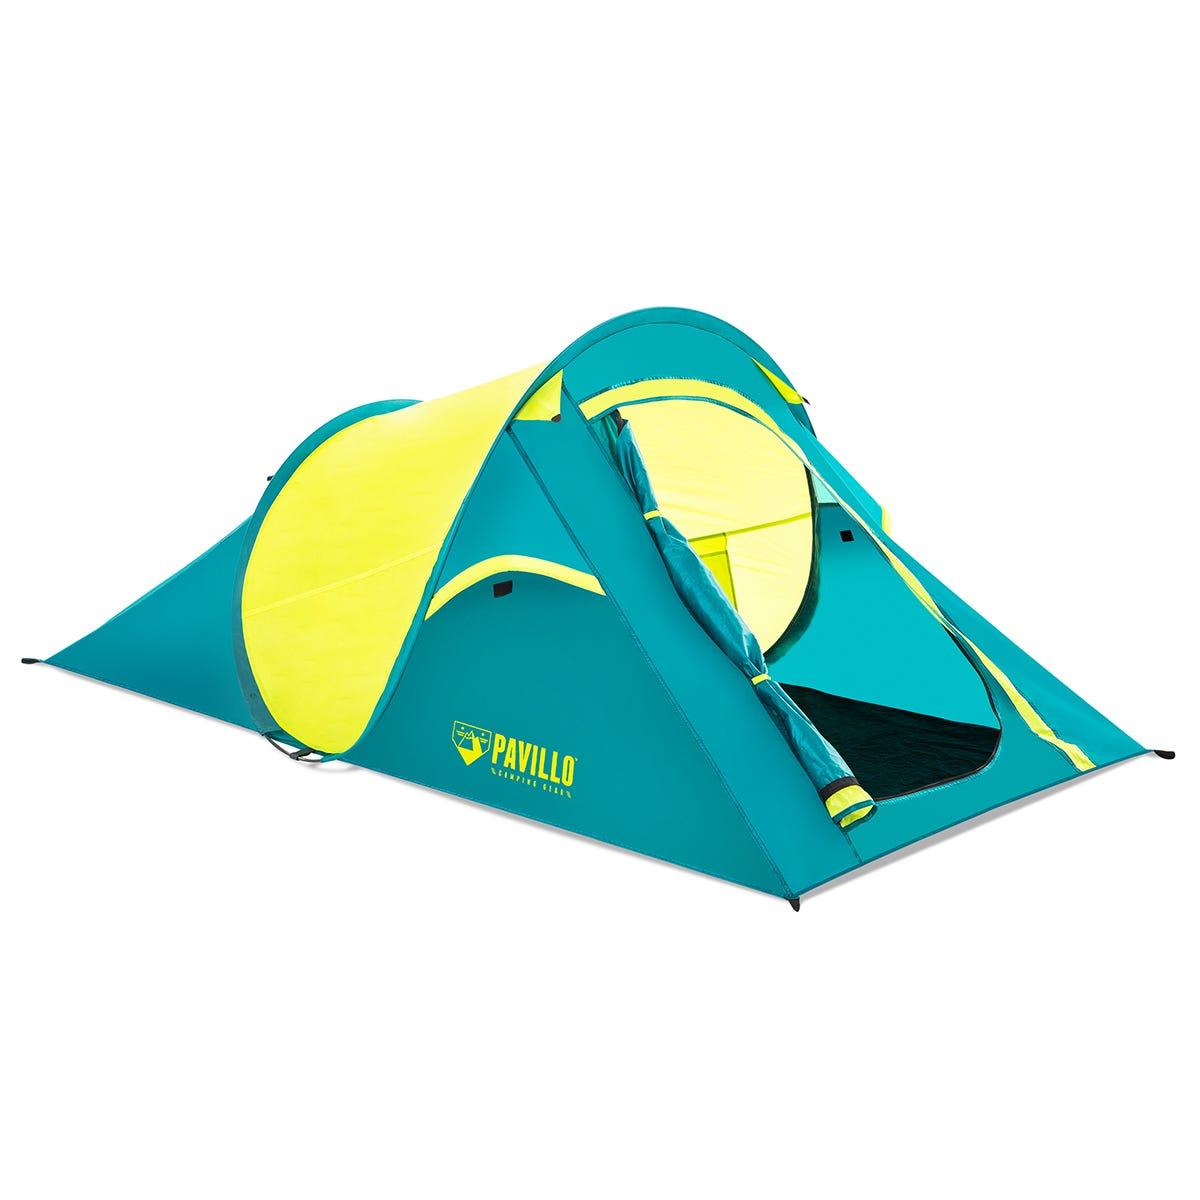 Pavillo Coolquick 2 Person Tent - 2.20 x 1.20 x 0.90m